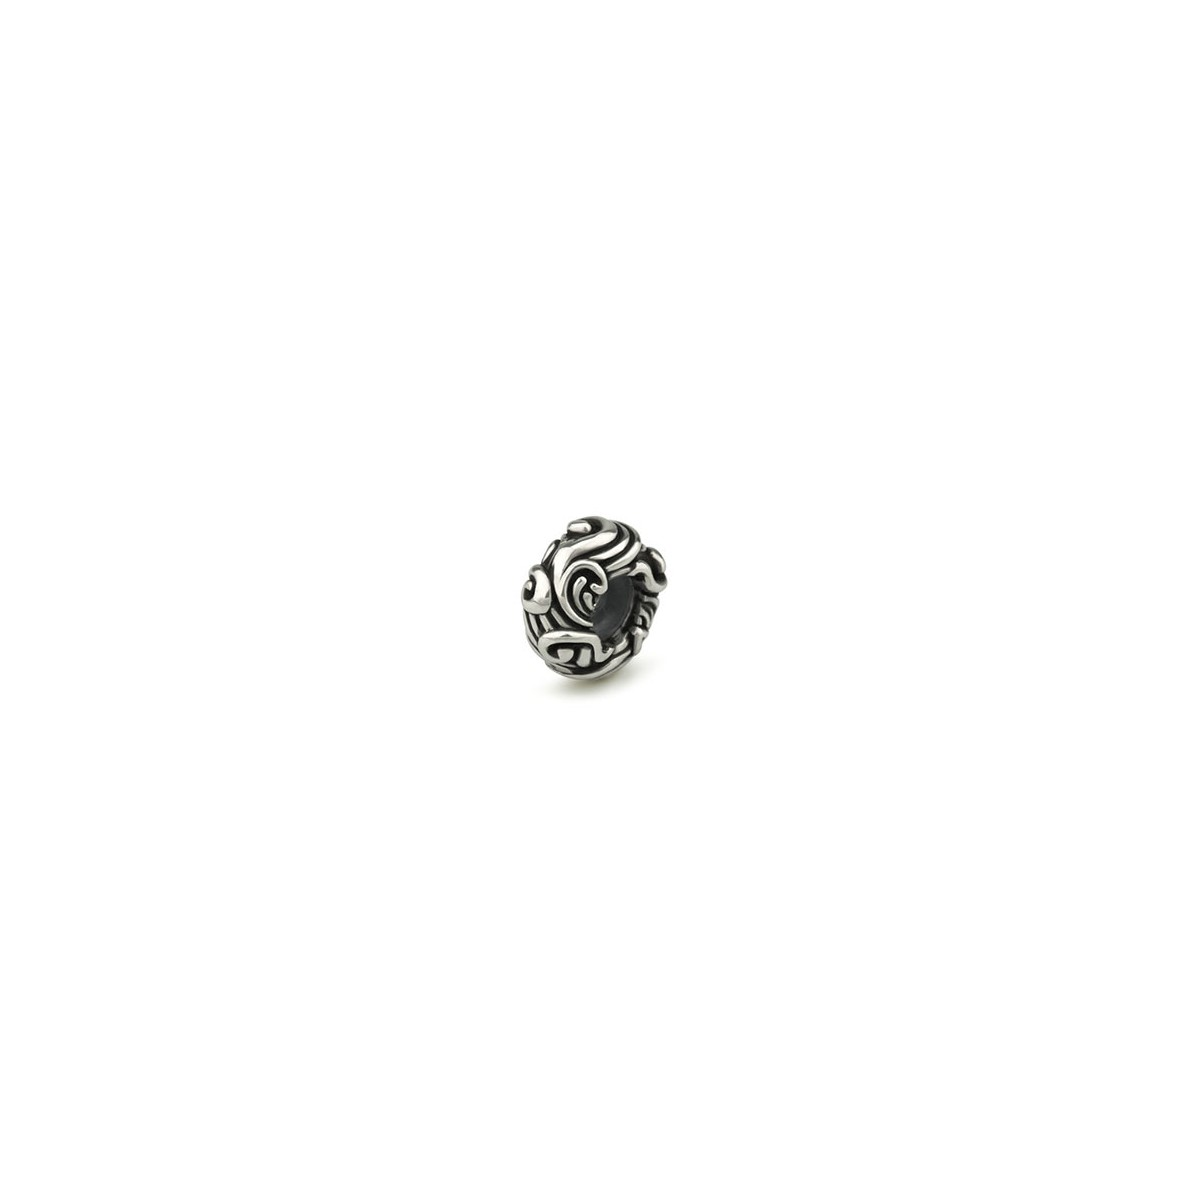 ohm beads/whc003/stop/ water-ish/pandora/trollbeads